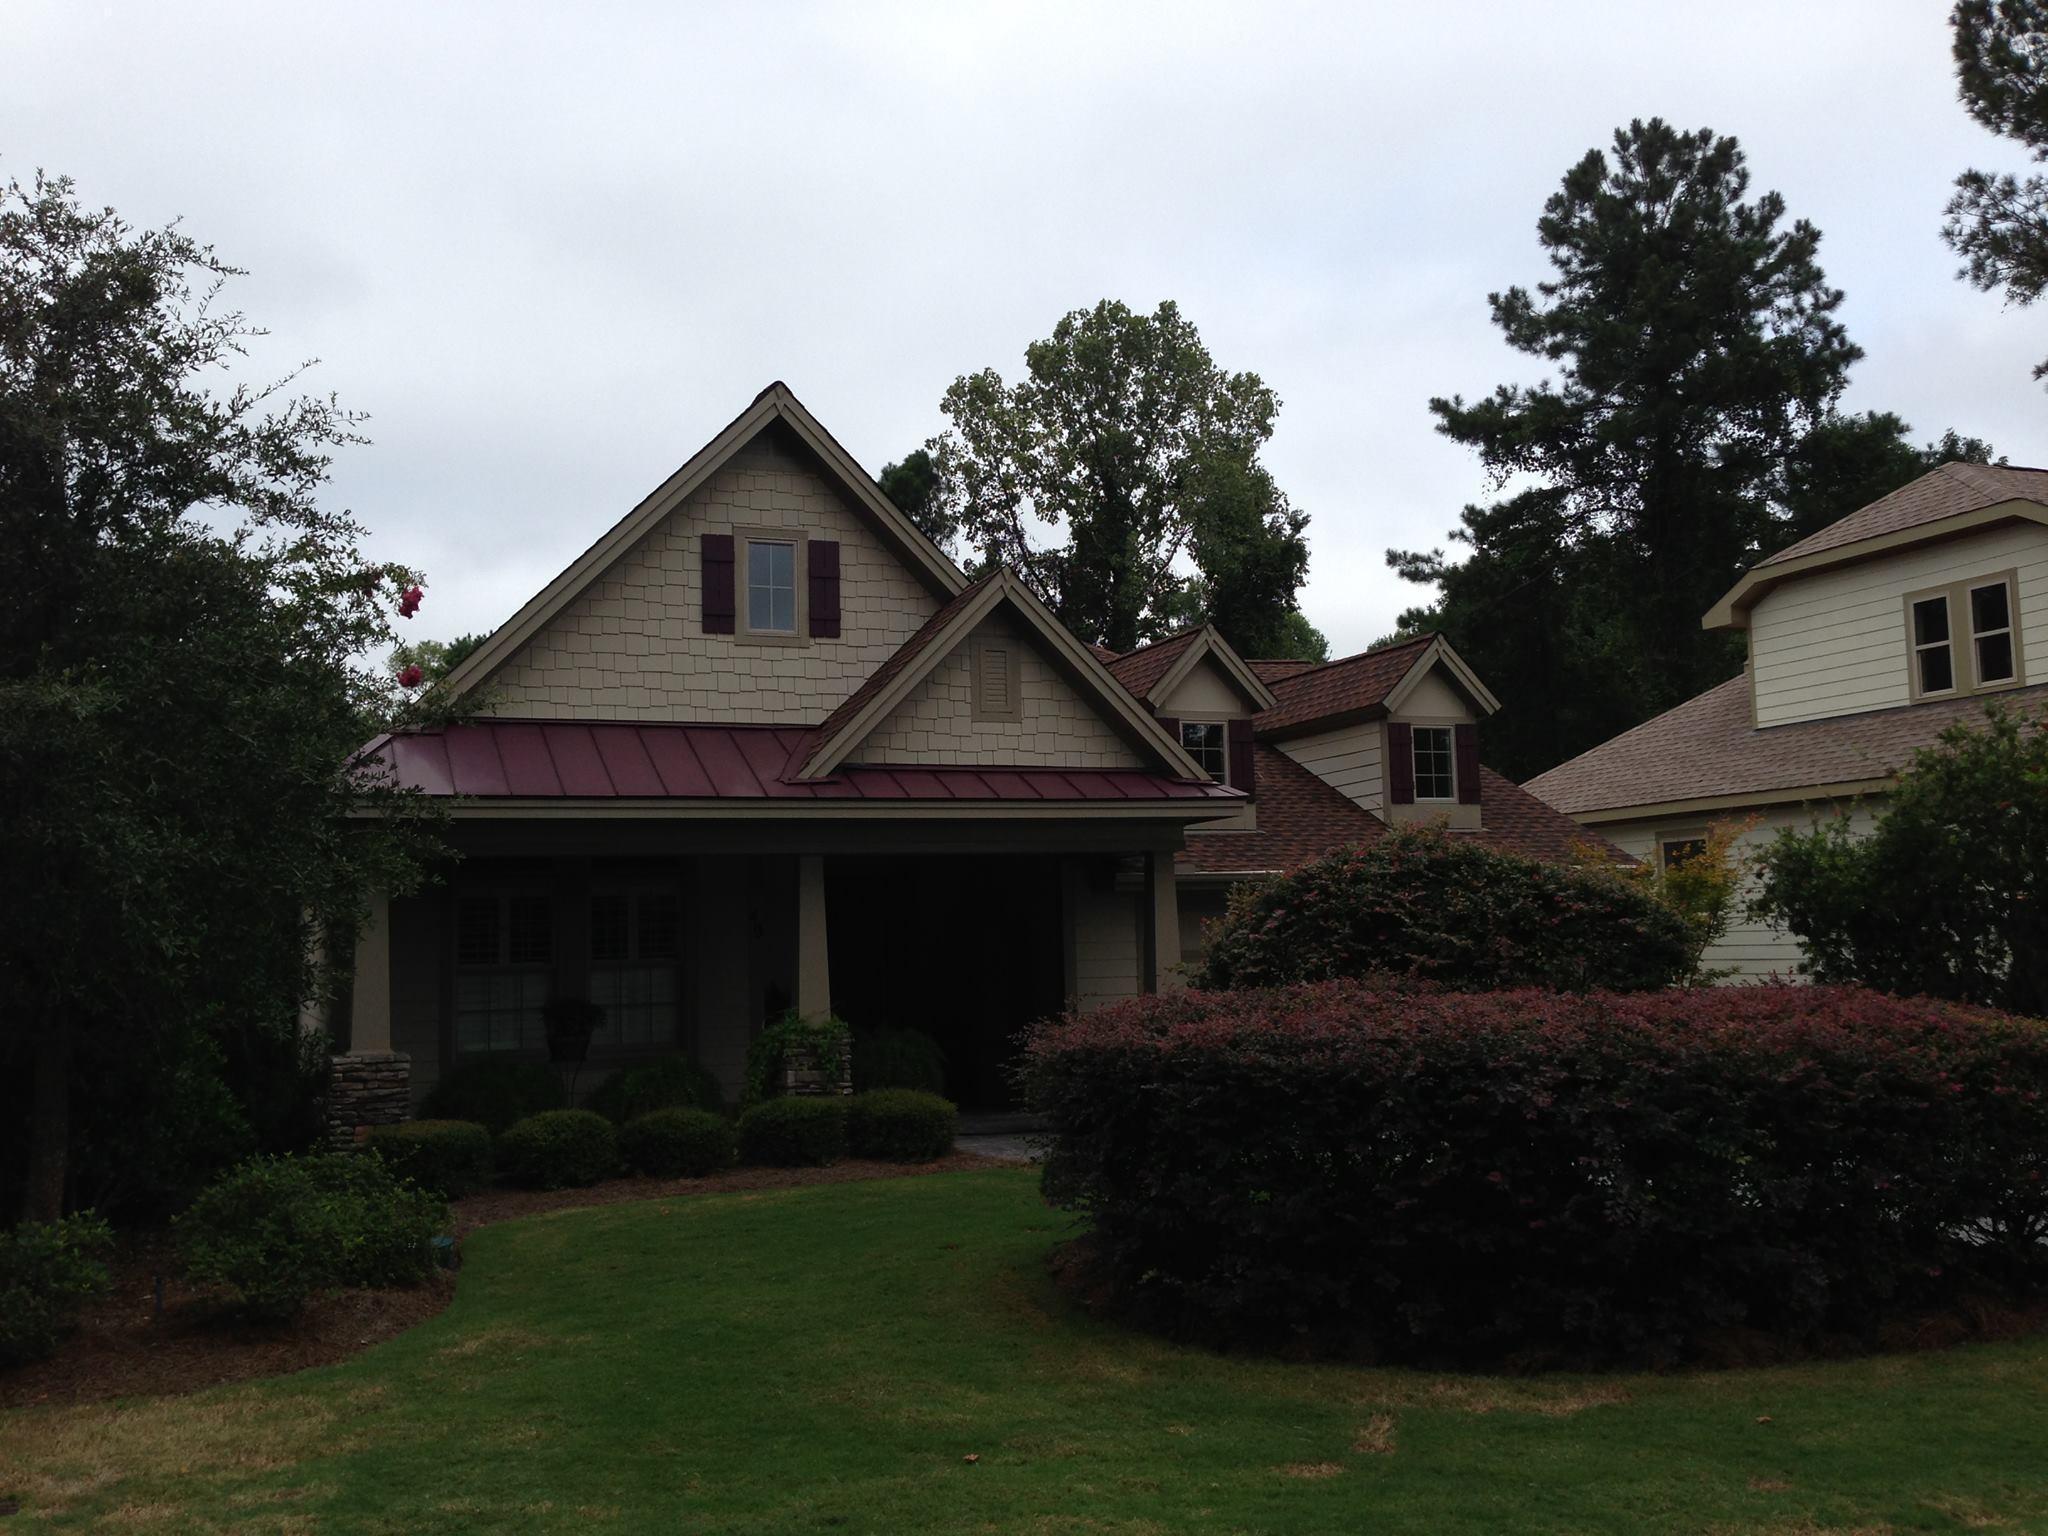 RoofCrafters-Savannah image 72